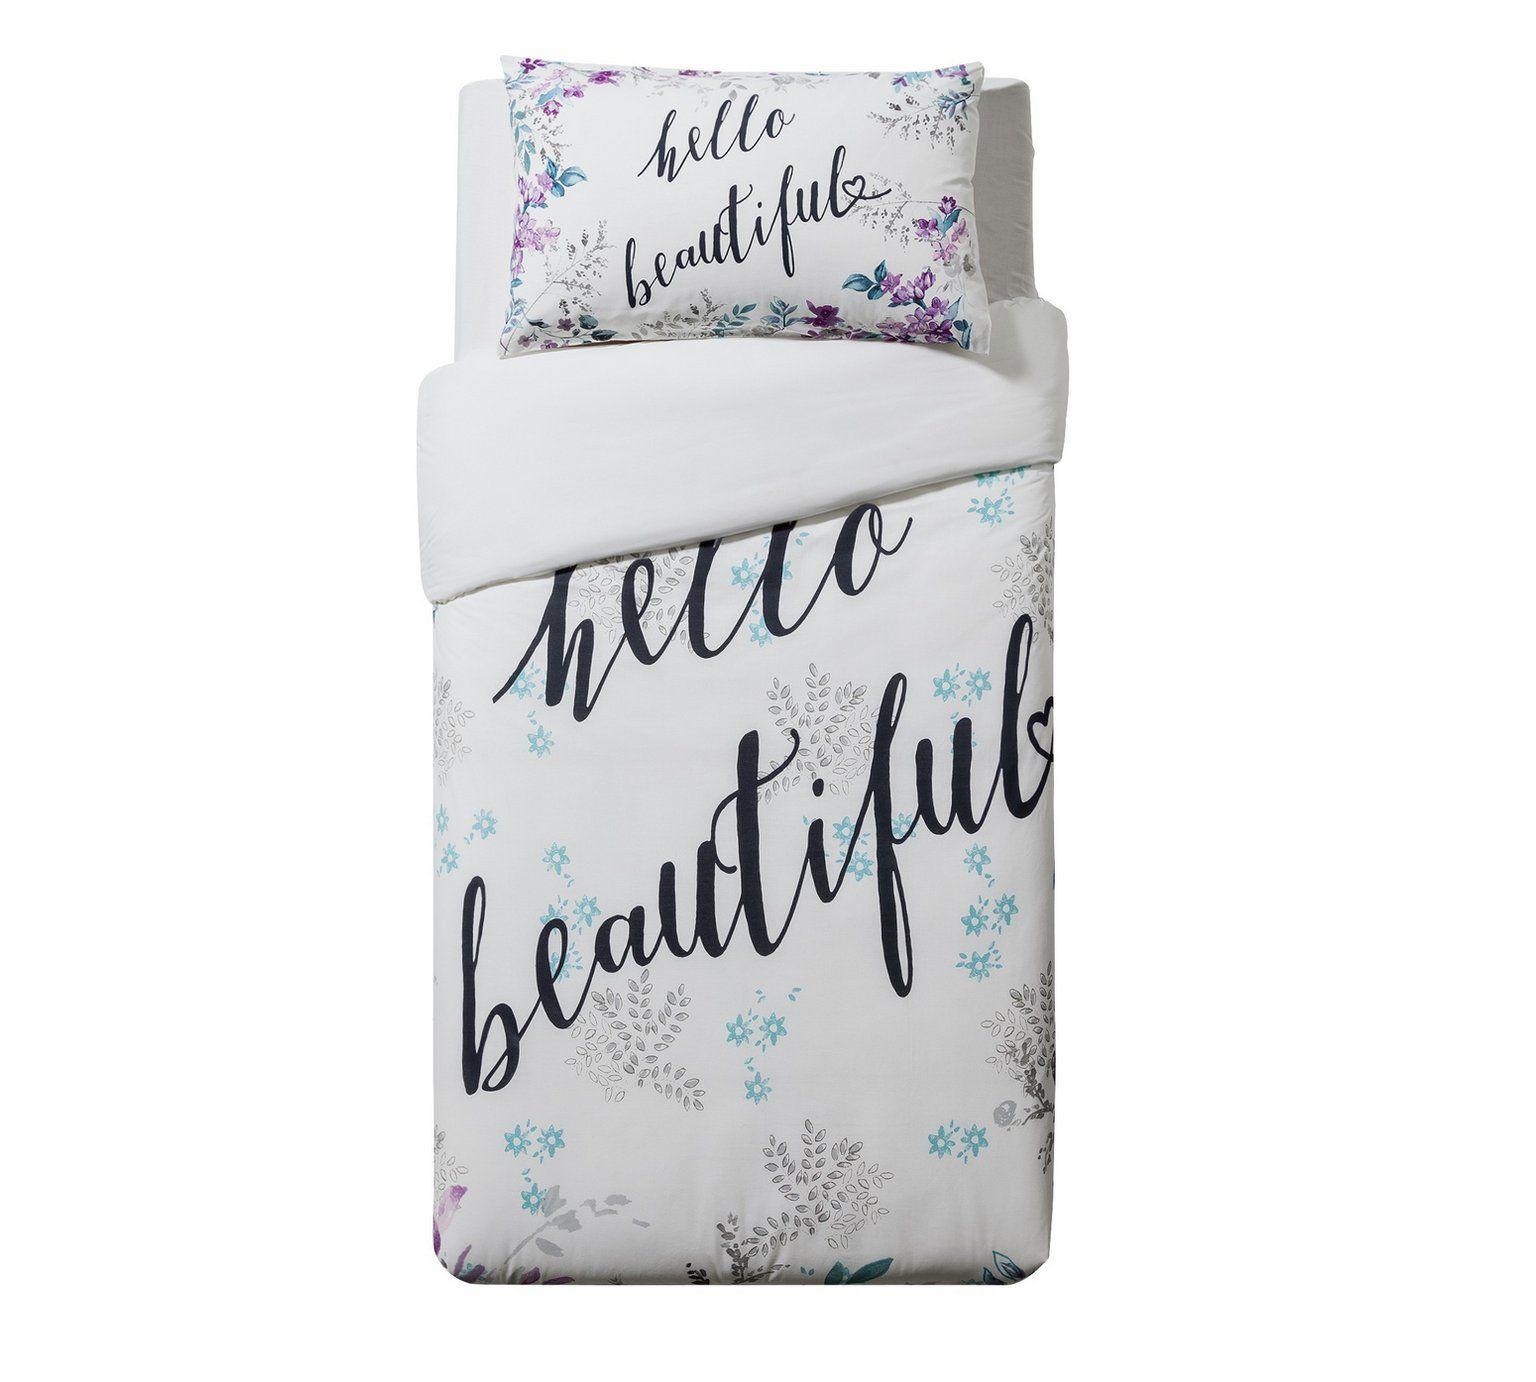 Buy Home Hello Beautiful Bedding Set Single Duvet Cover Sets